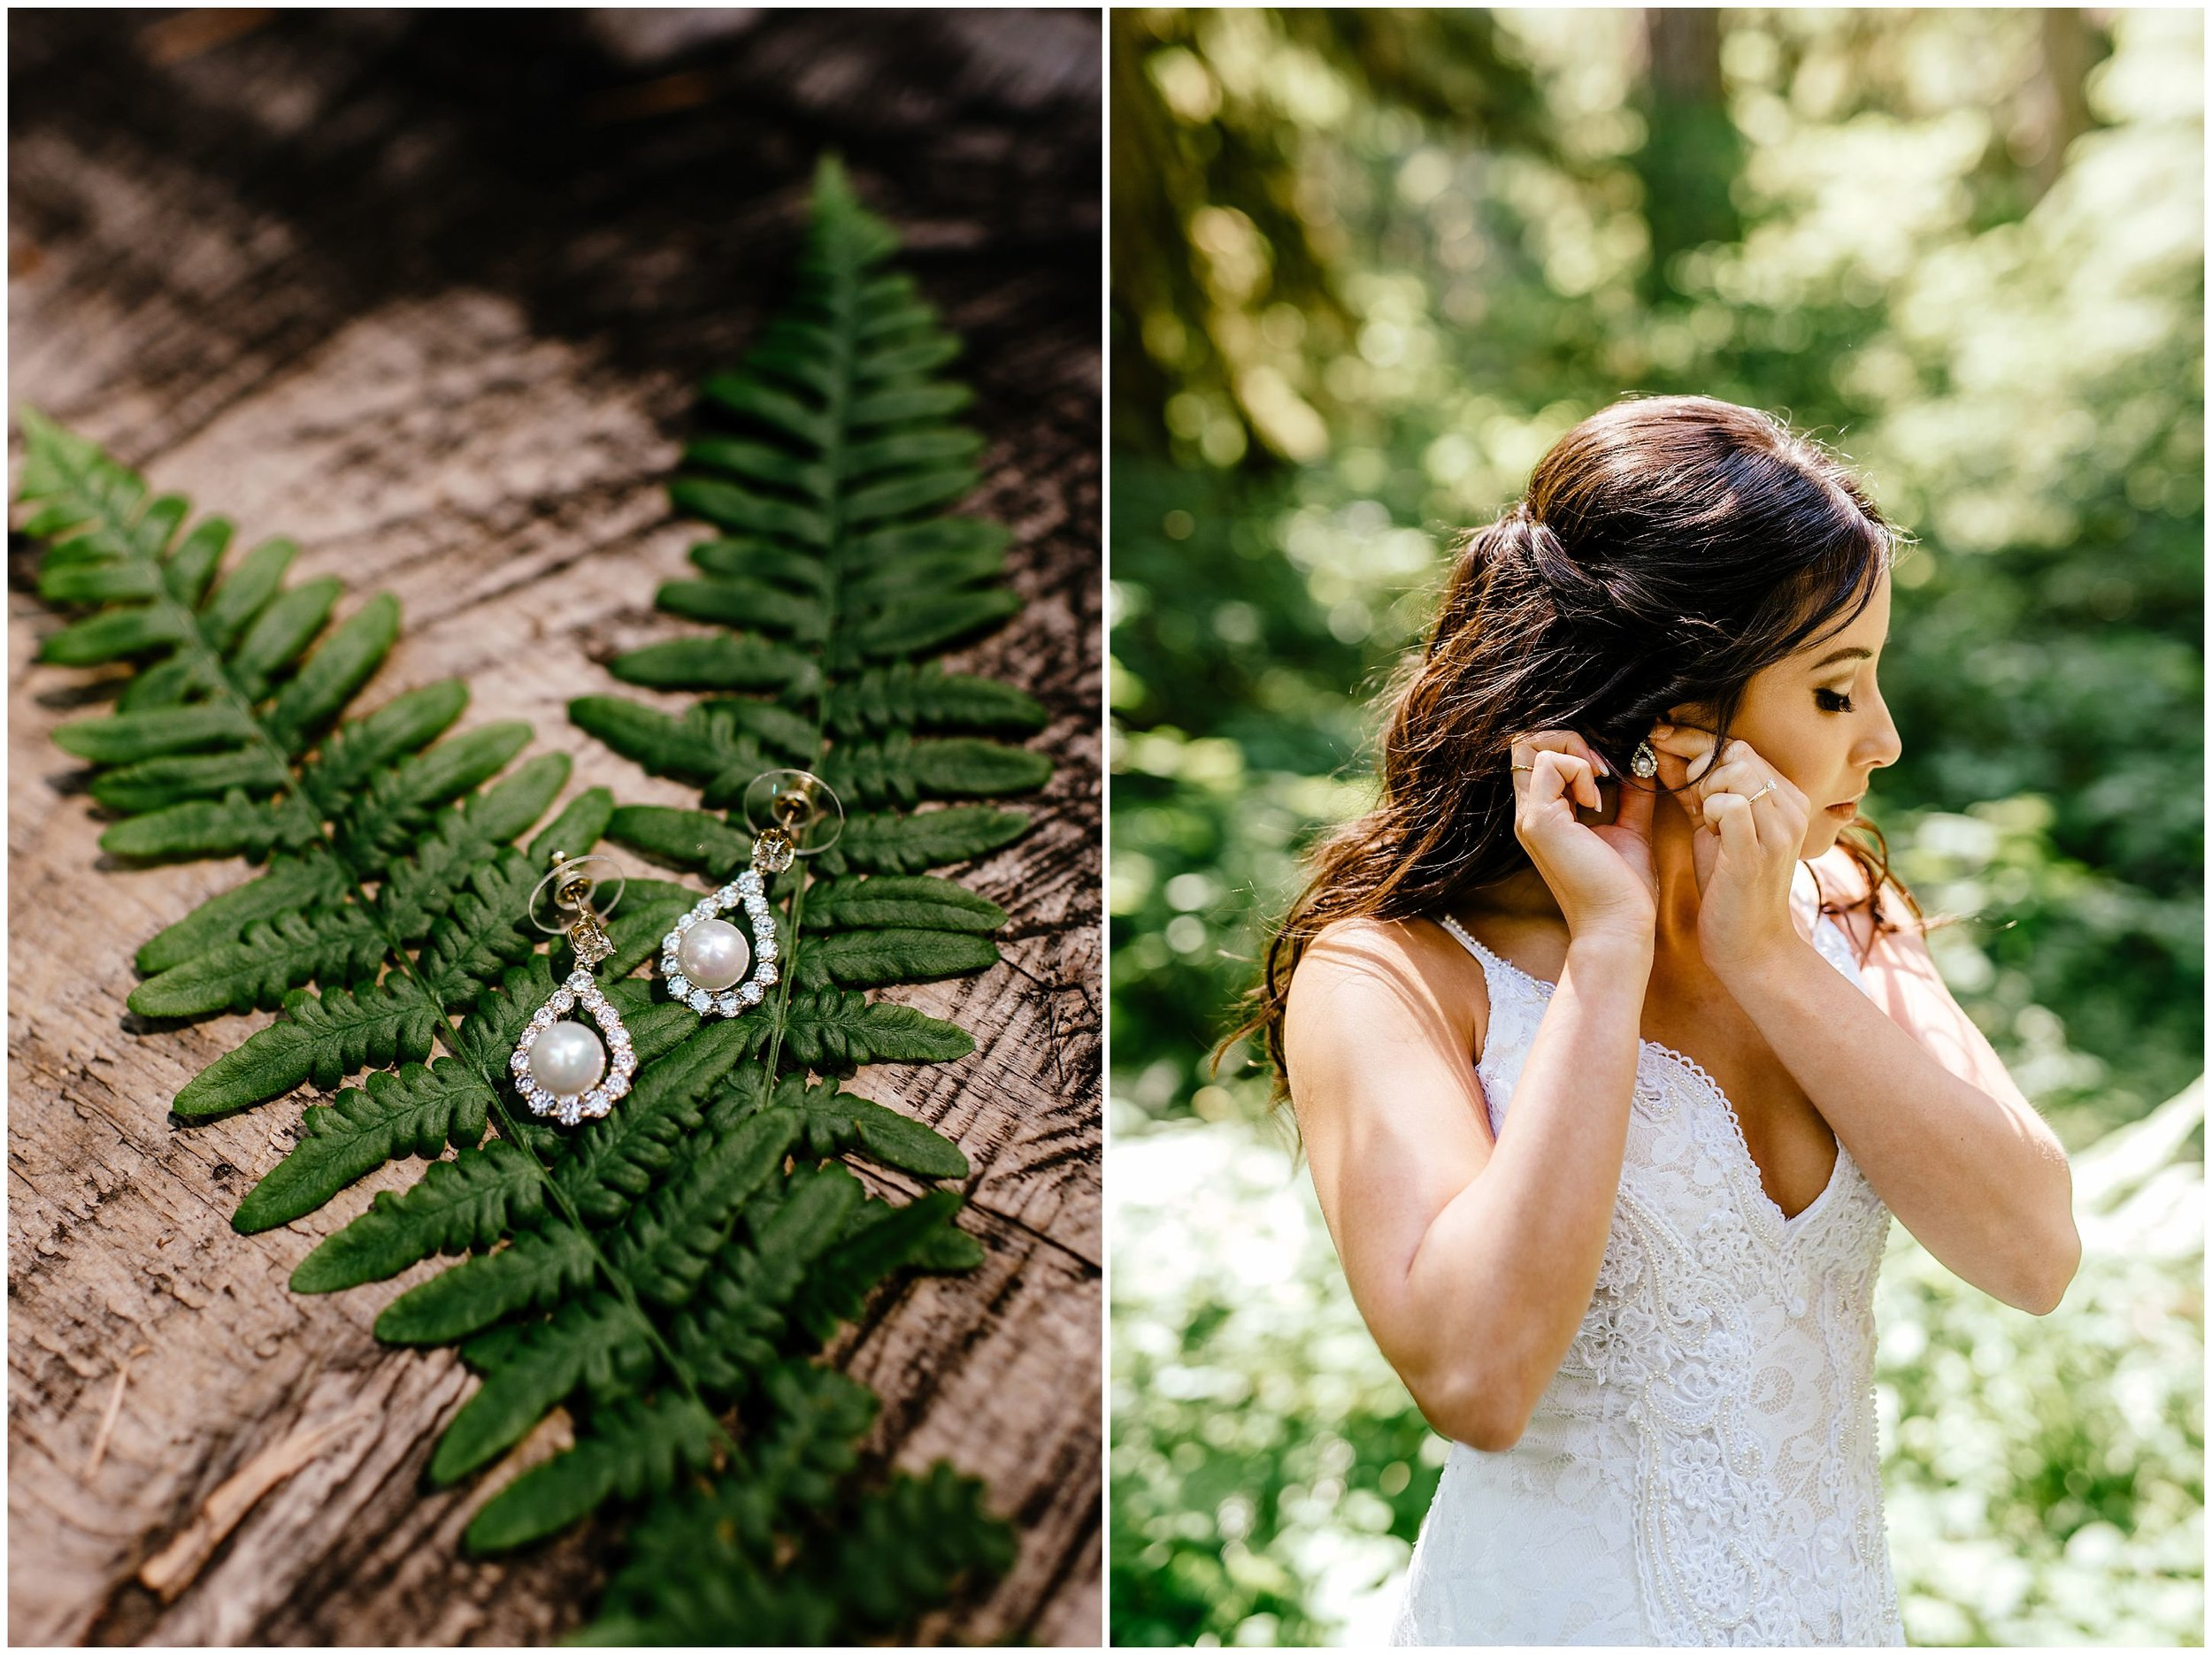 Silver-falls-state-park-wedding-71.jpg